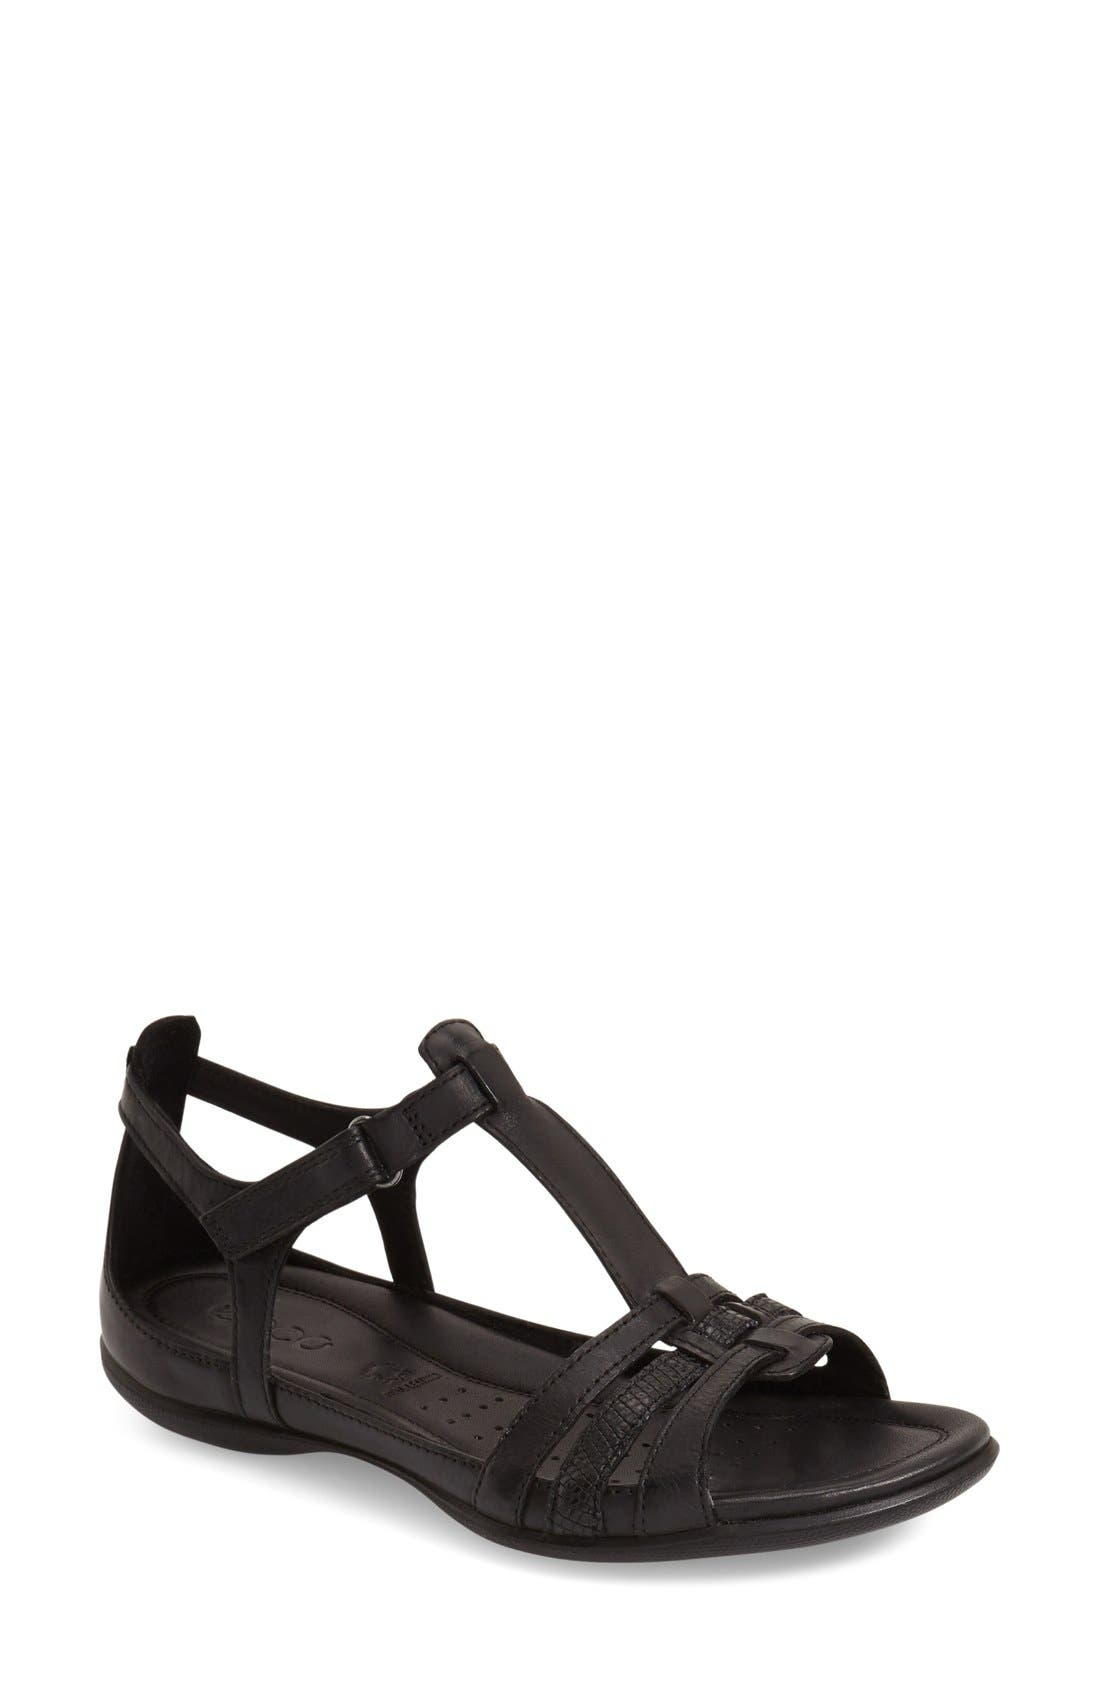 Alternate Image 1 Selected - ECCO 'Flash' Sandal (Women)